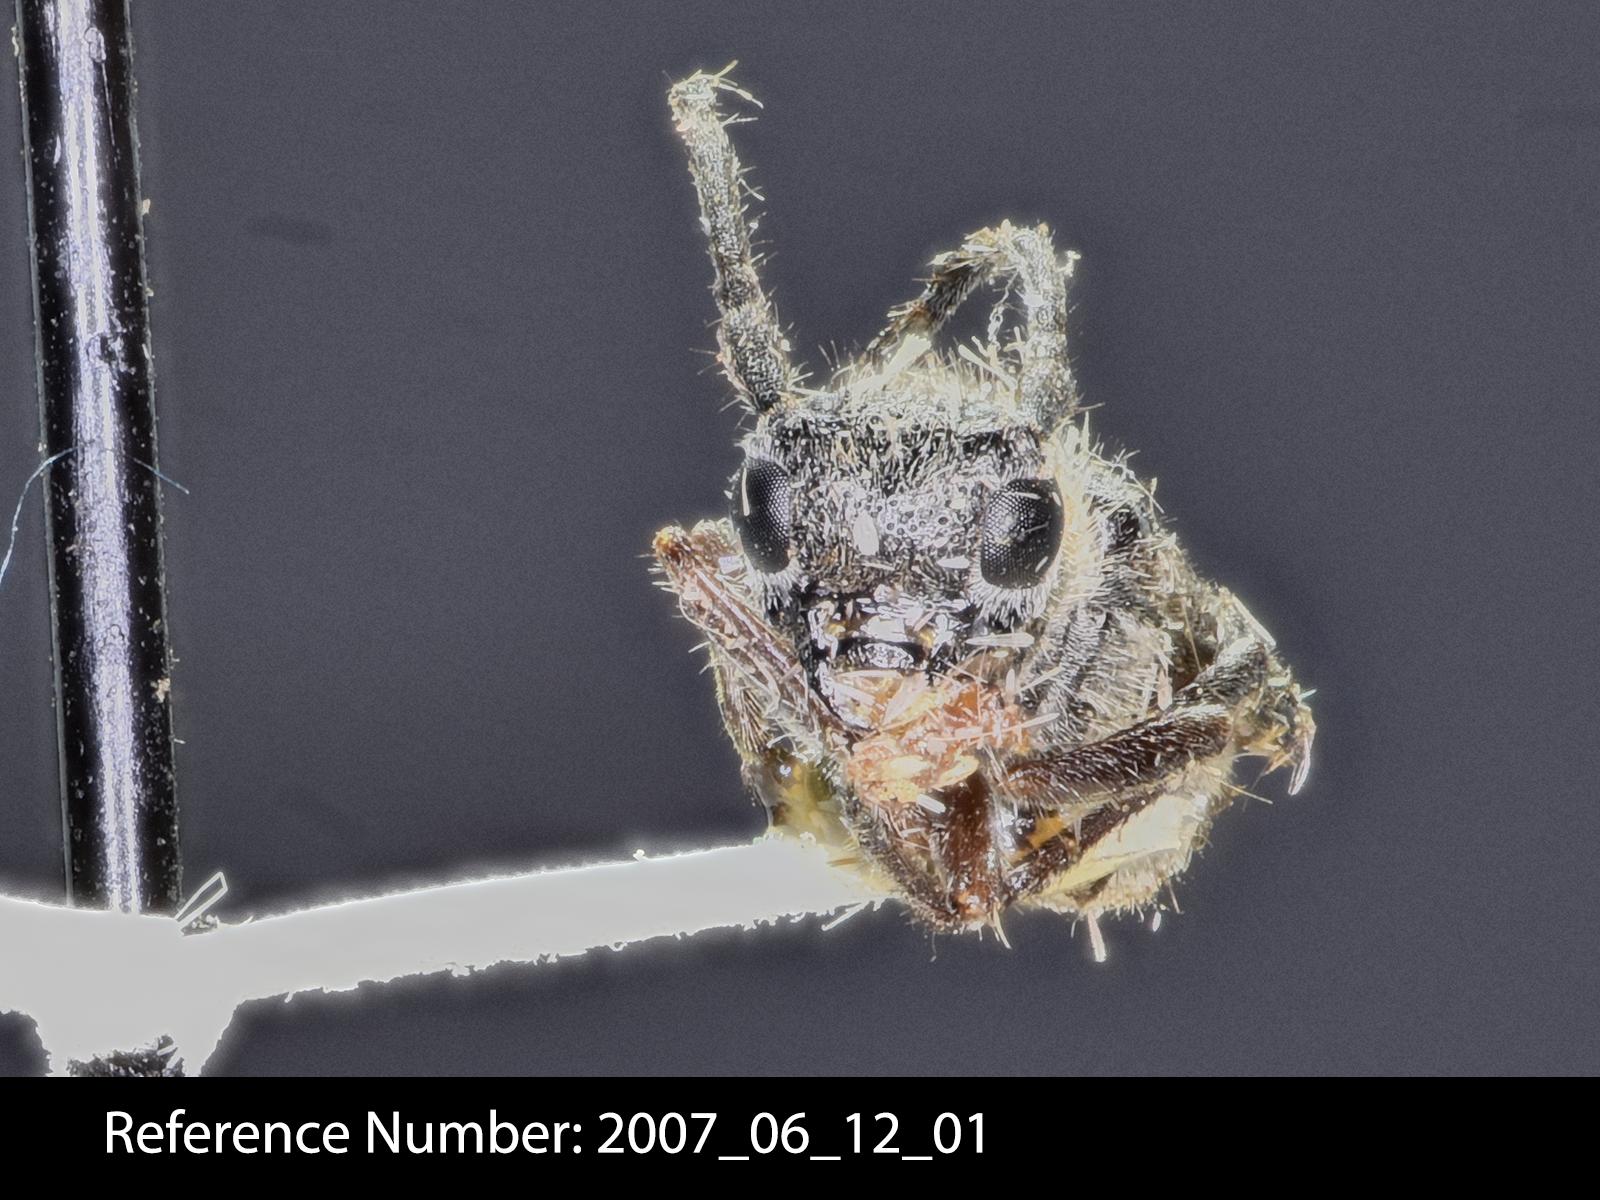 Oberea pruinosa frontal view